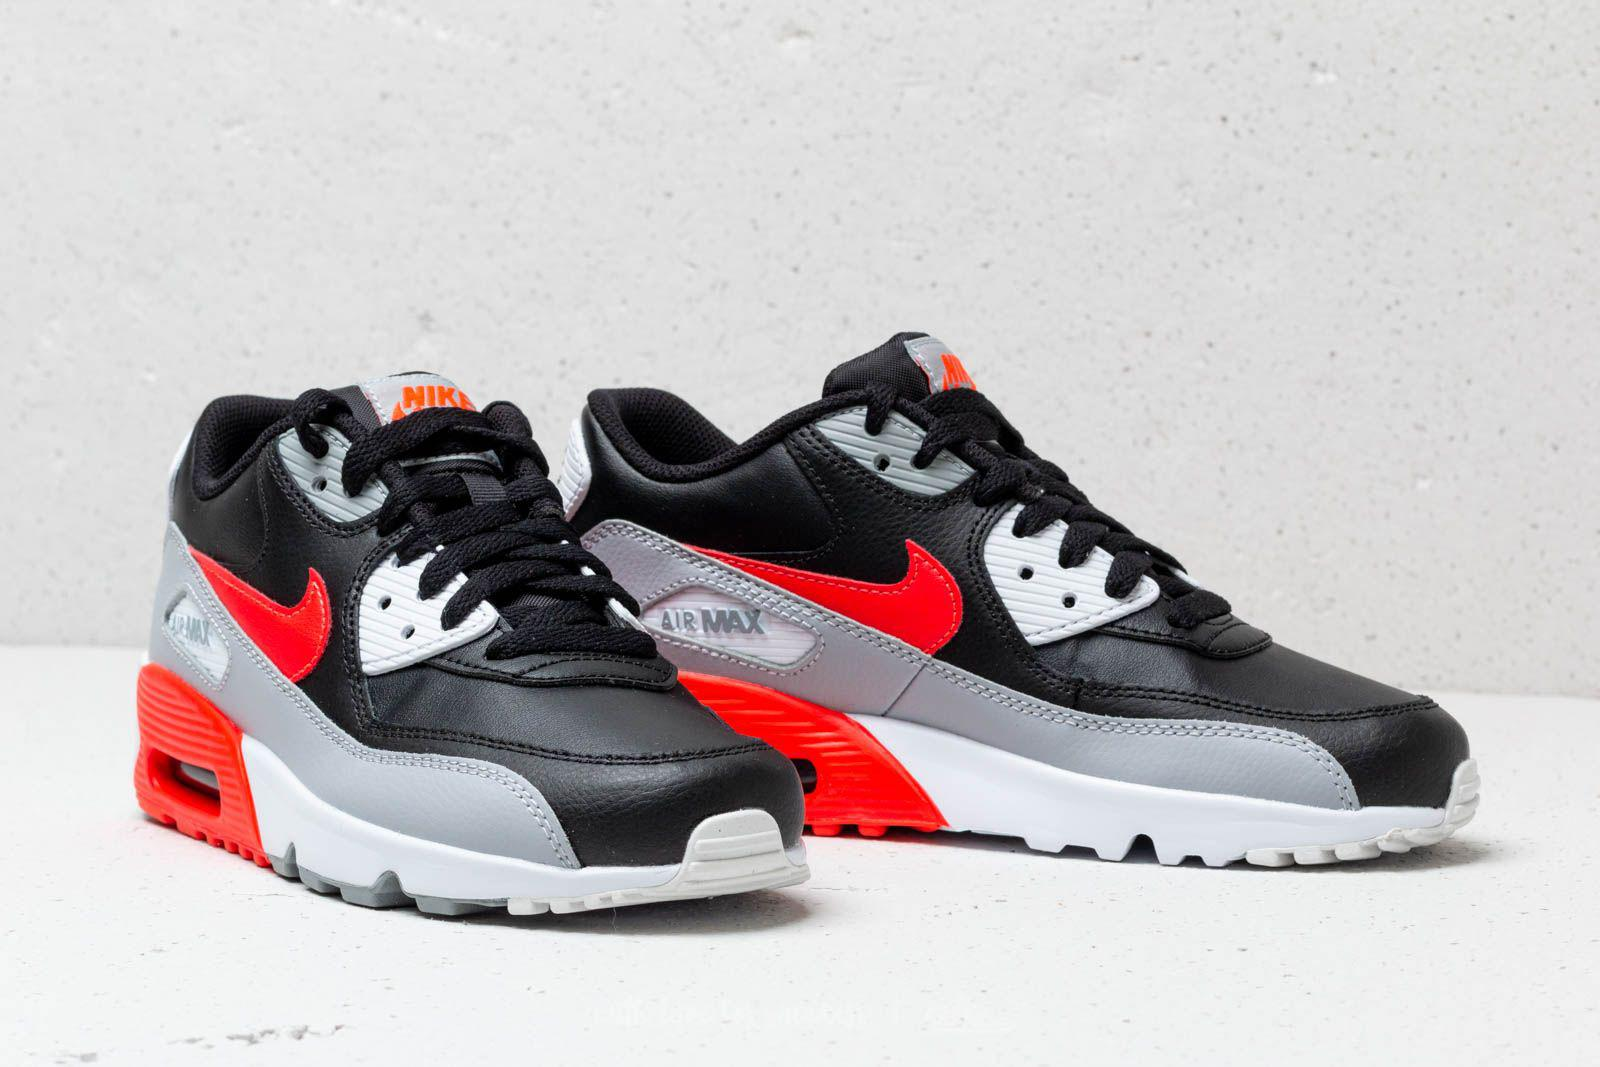 442d2744181d Lyst - Nike Air Max 90 Leather (gs) Wolf Grey  Bright Crimson-black ...